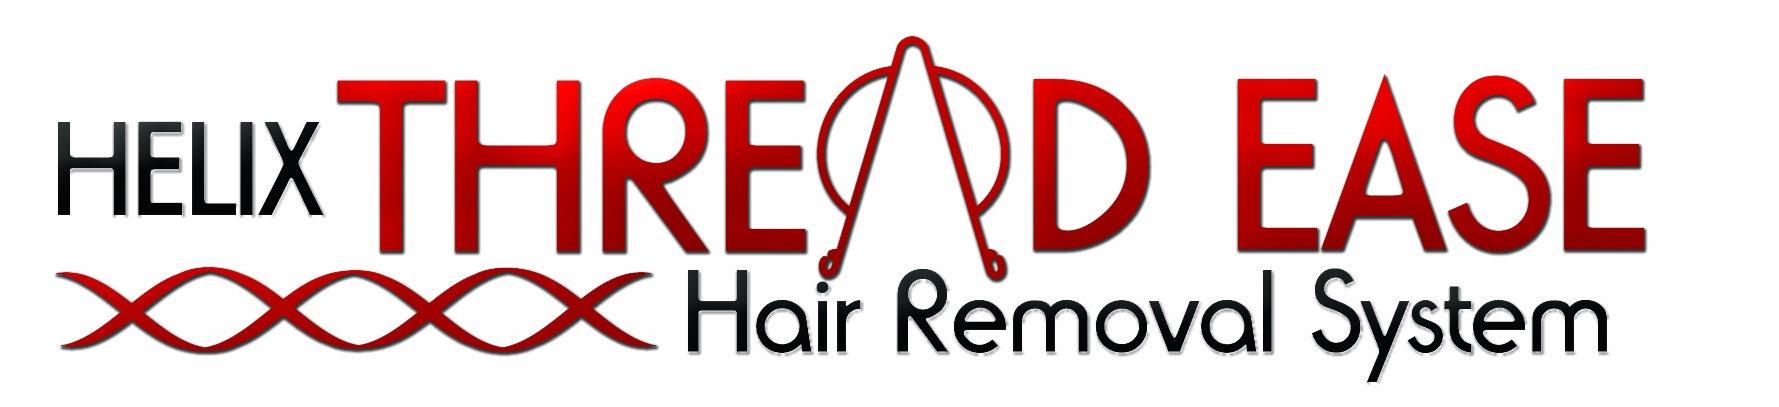 Helix Threadease Hair Removal Threading Kit Black